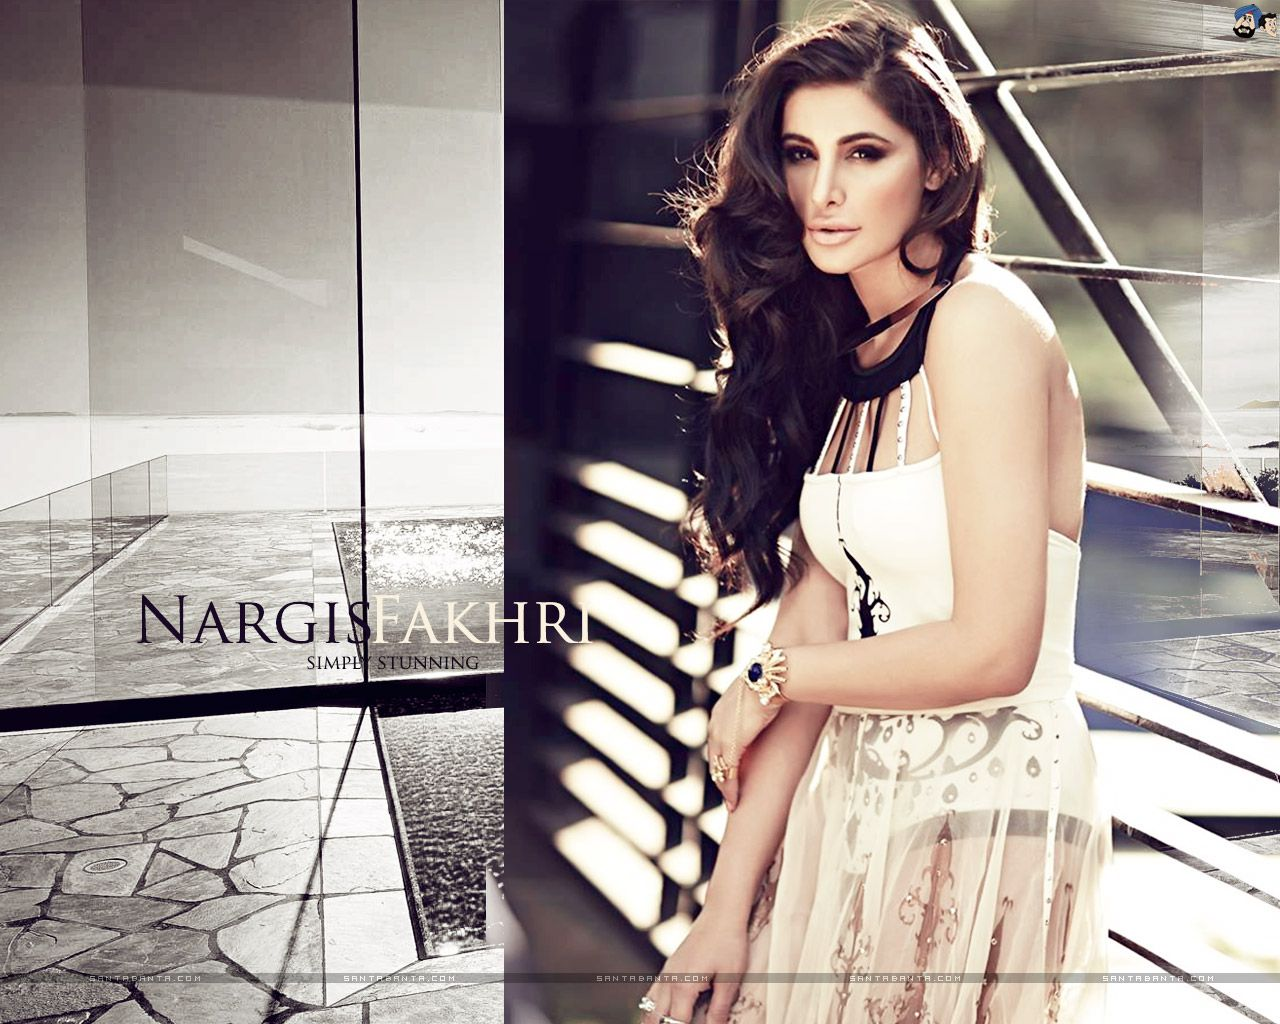 nargis-fakhri-48a.jpg